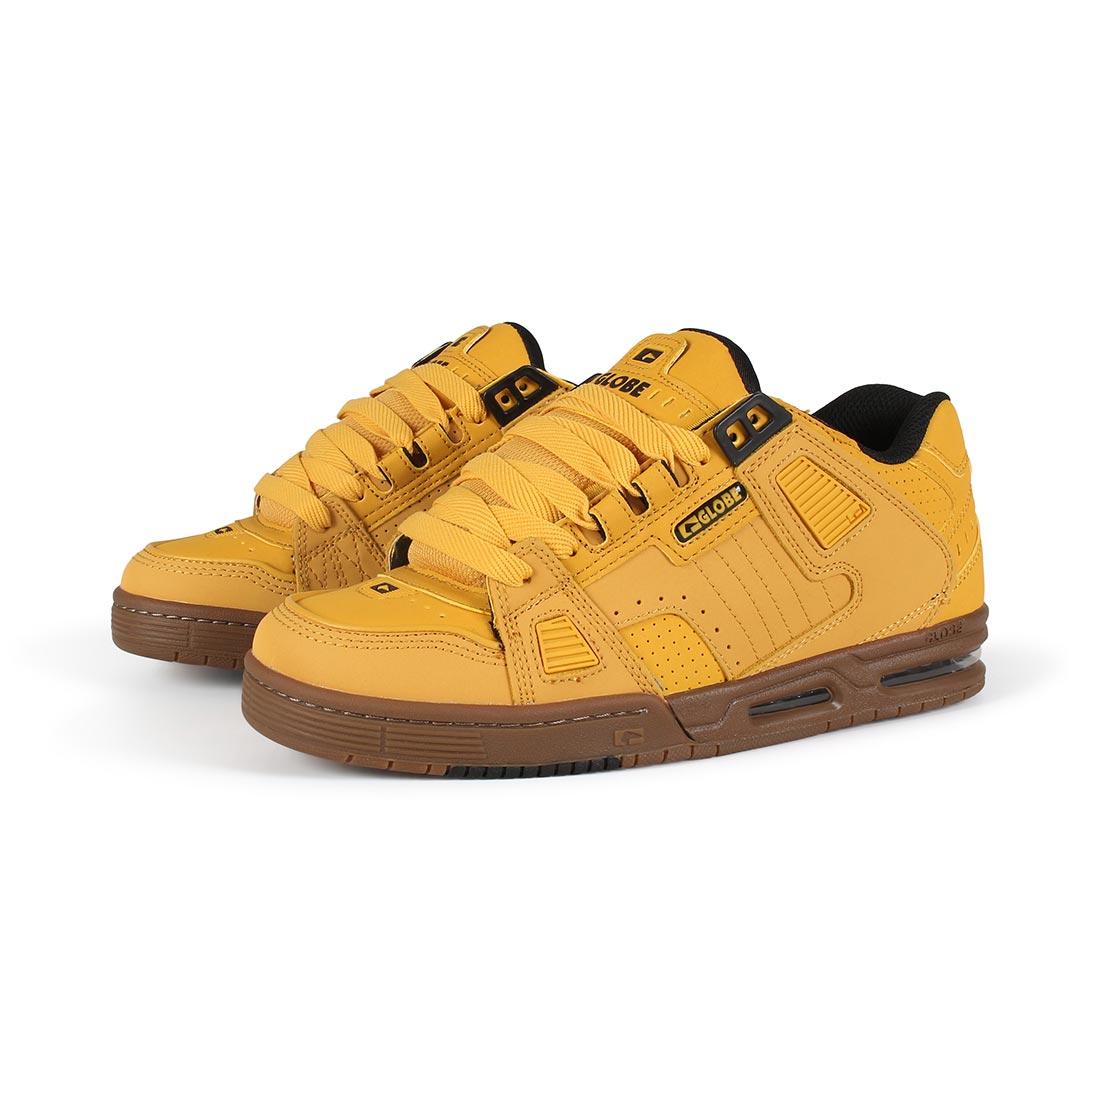 707441a0eeed11 Globe Sabre Shoes - Wheat / Tobacco